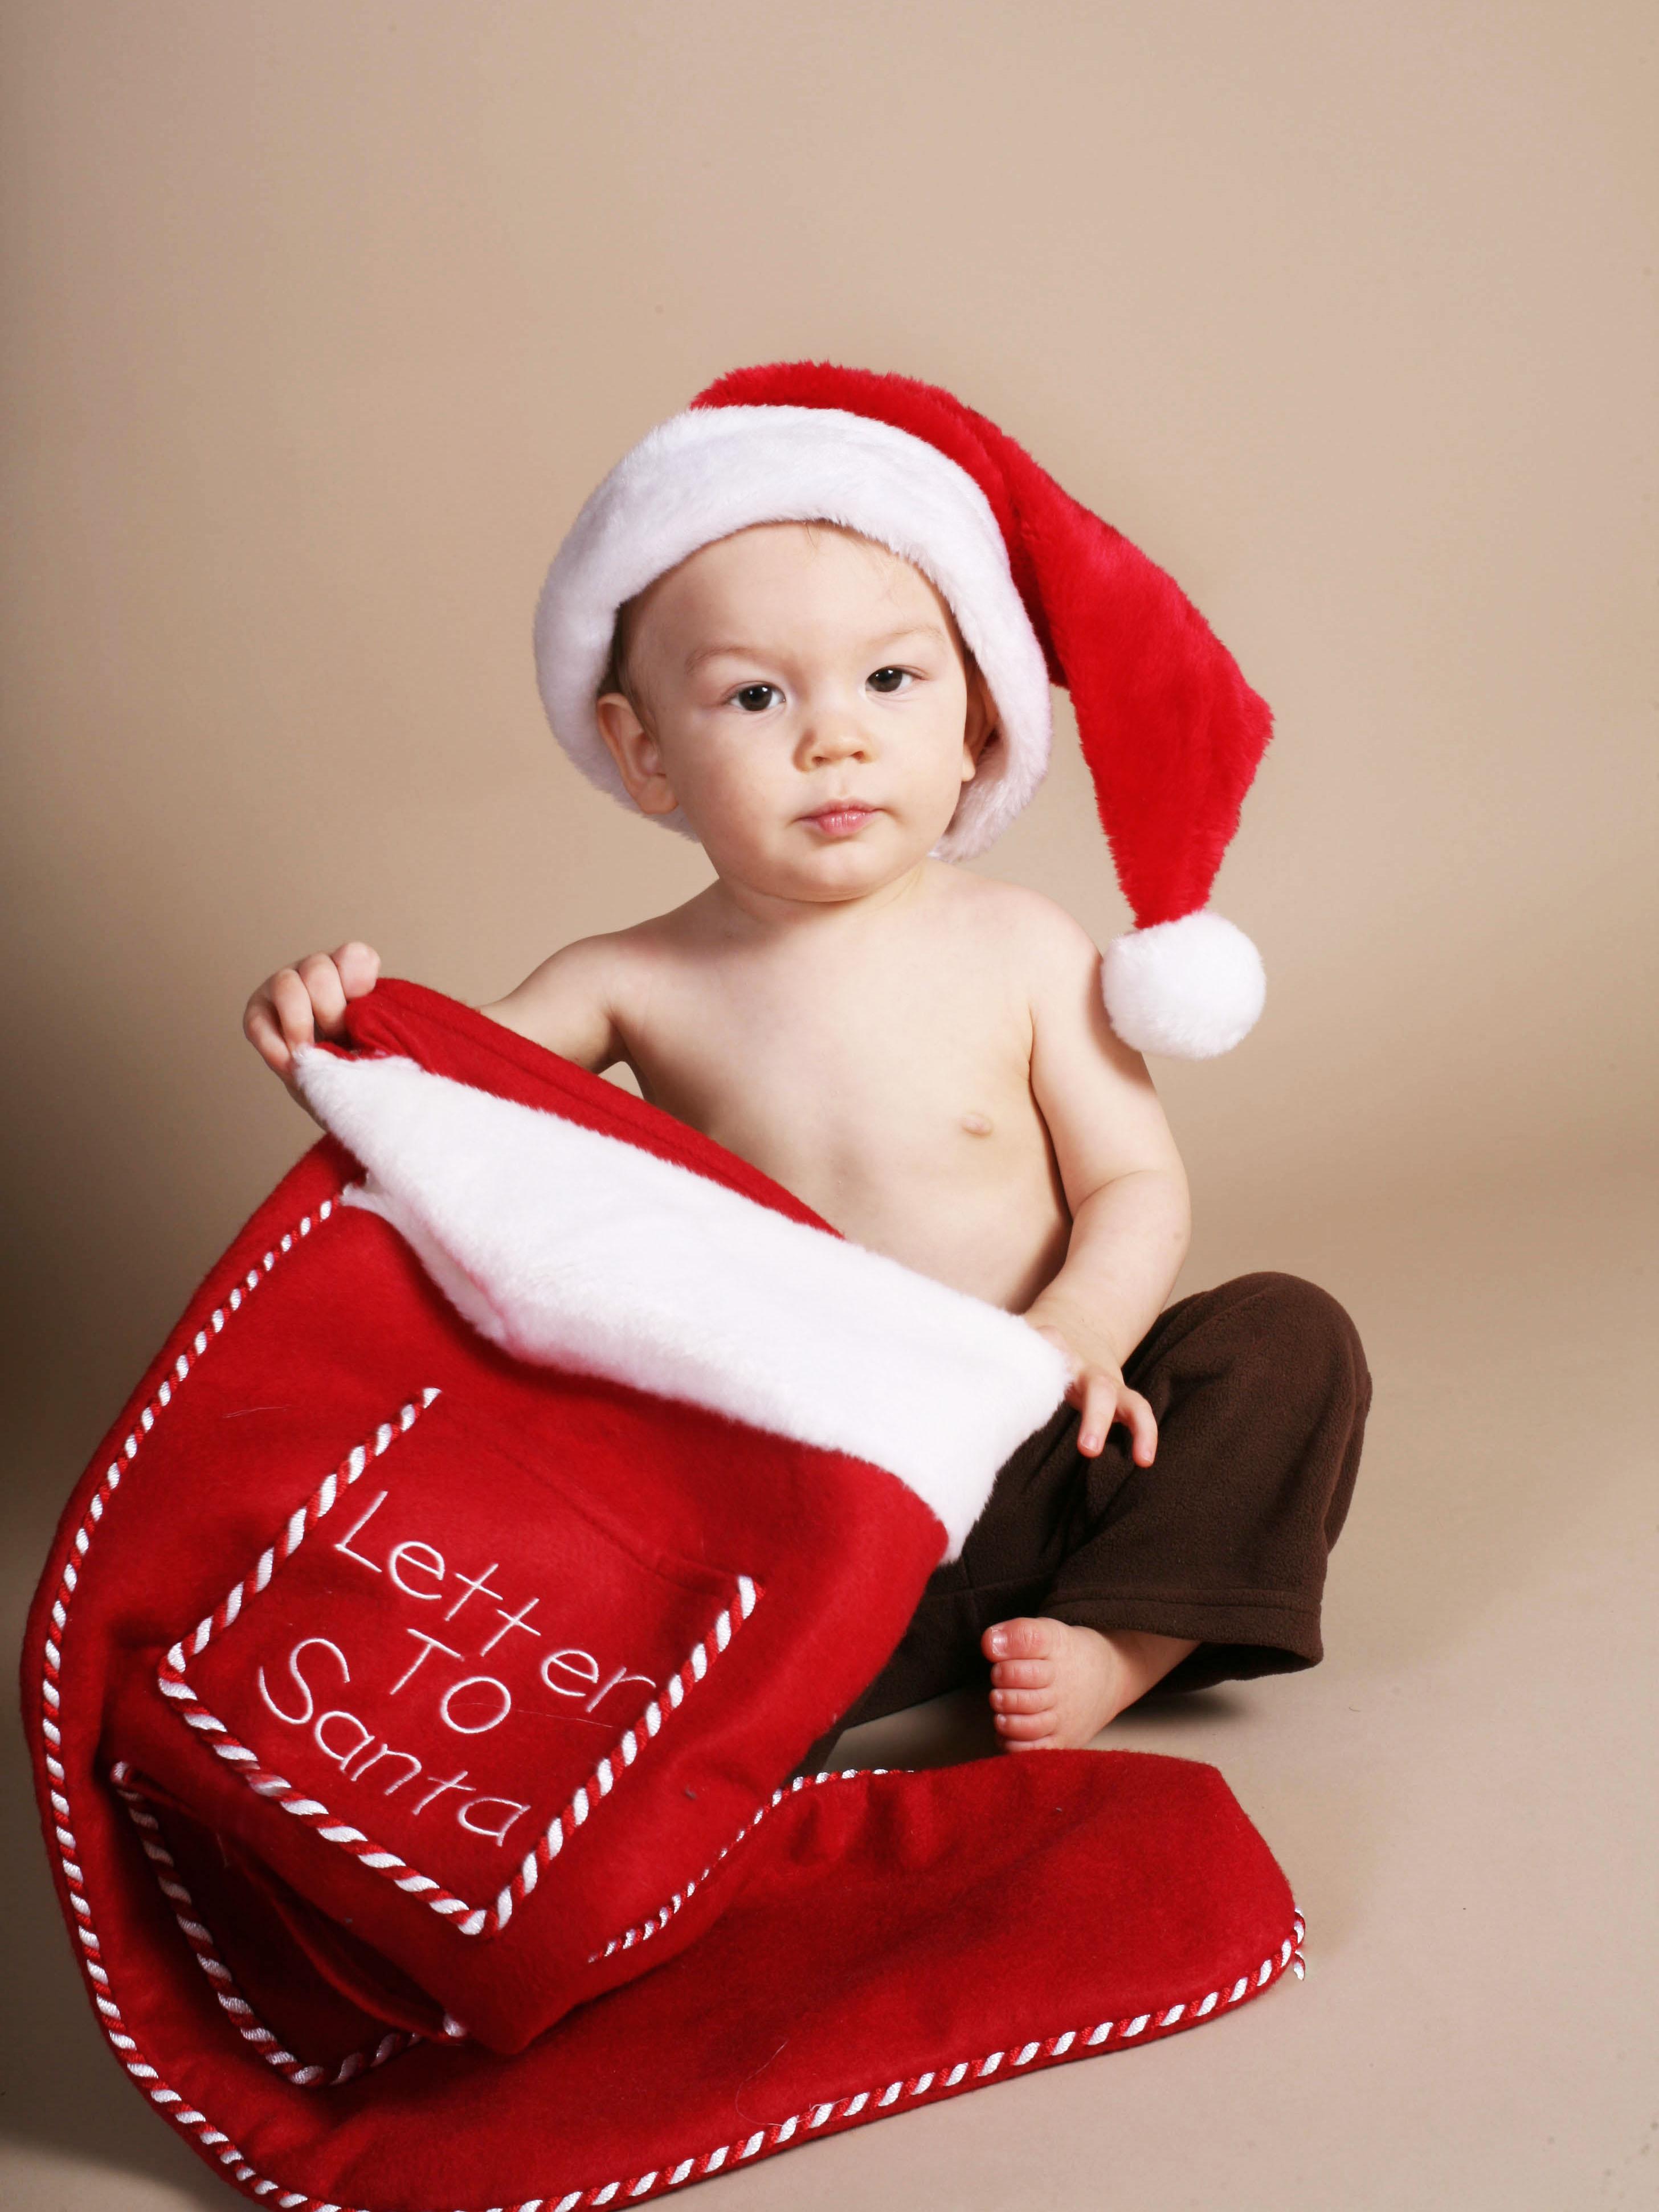 baby by VioletBreezeStock